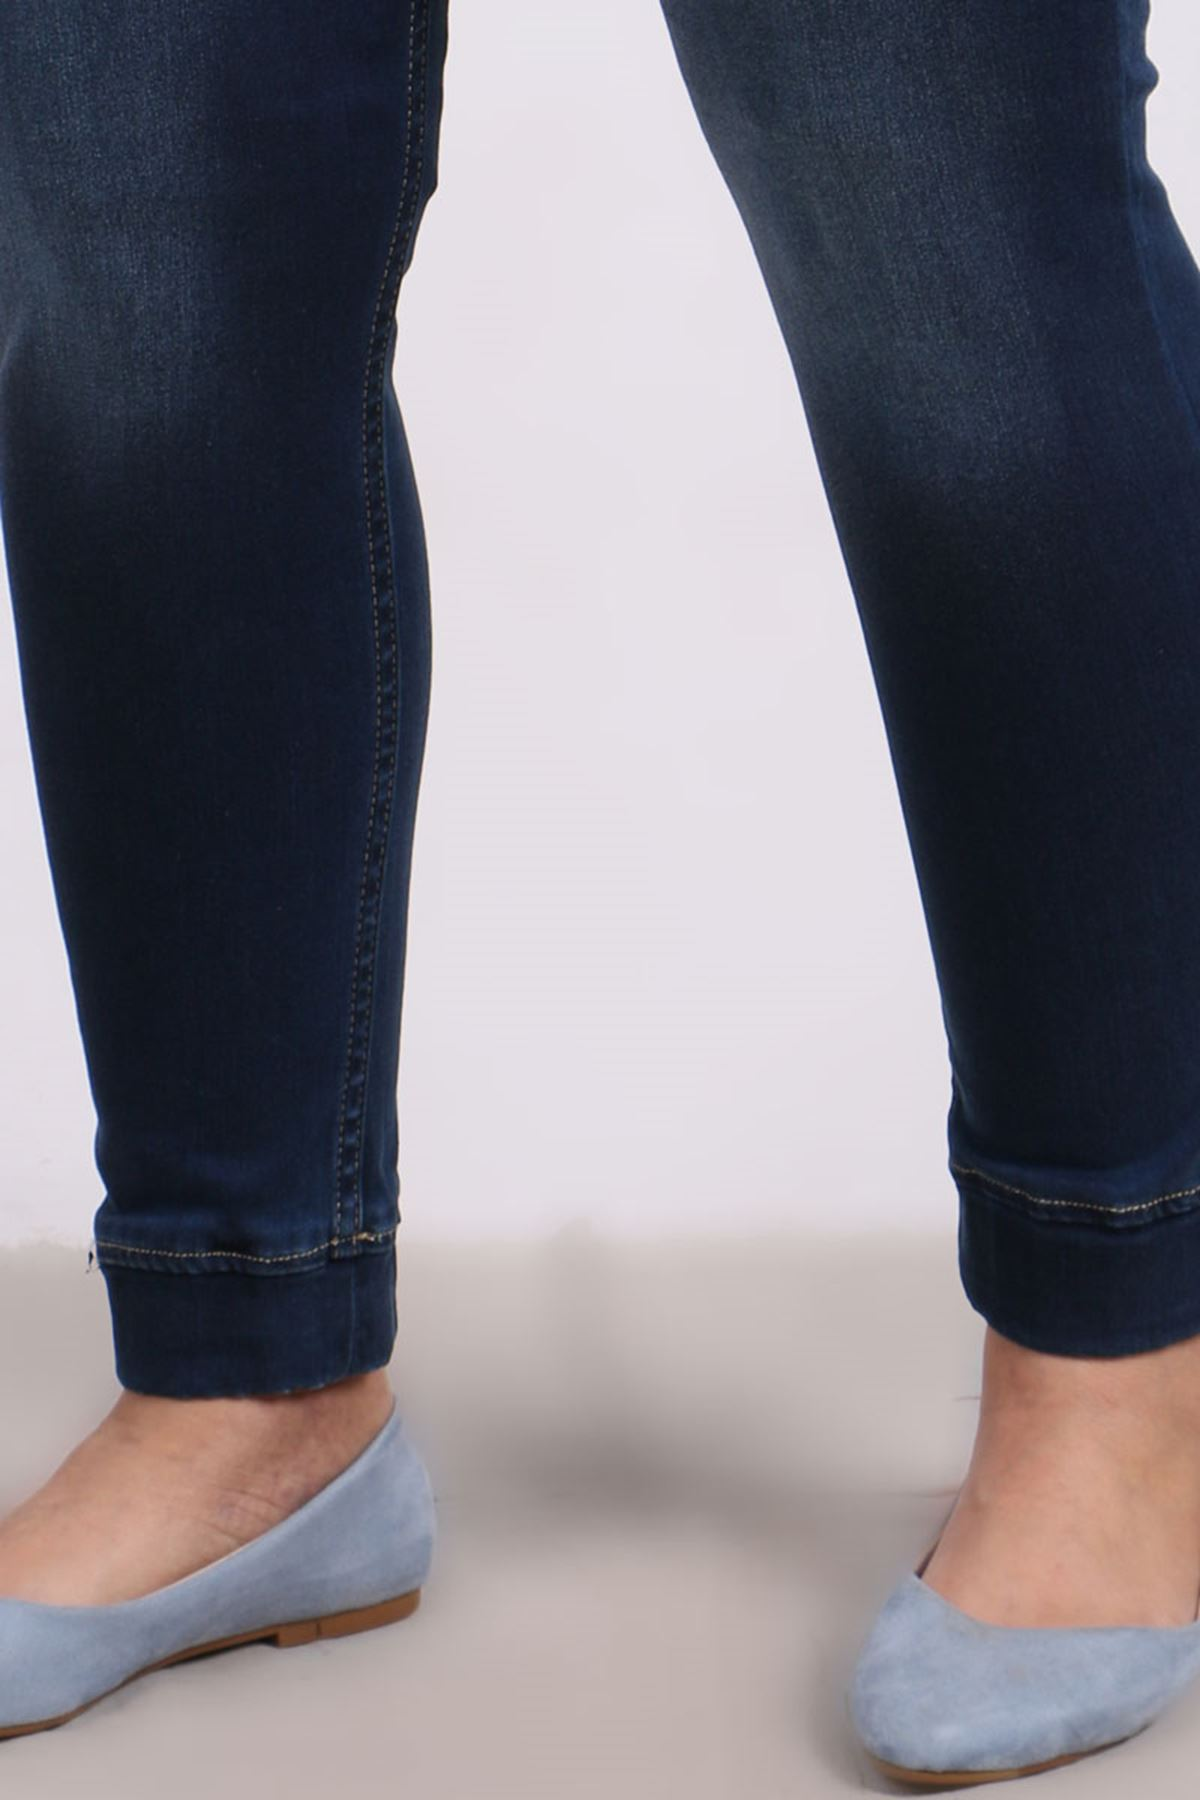 9139-1 Plus Size Elastic Waist Skinny Leg Jeans- Navy Blue